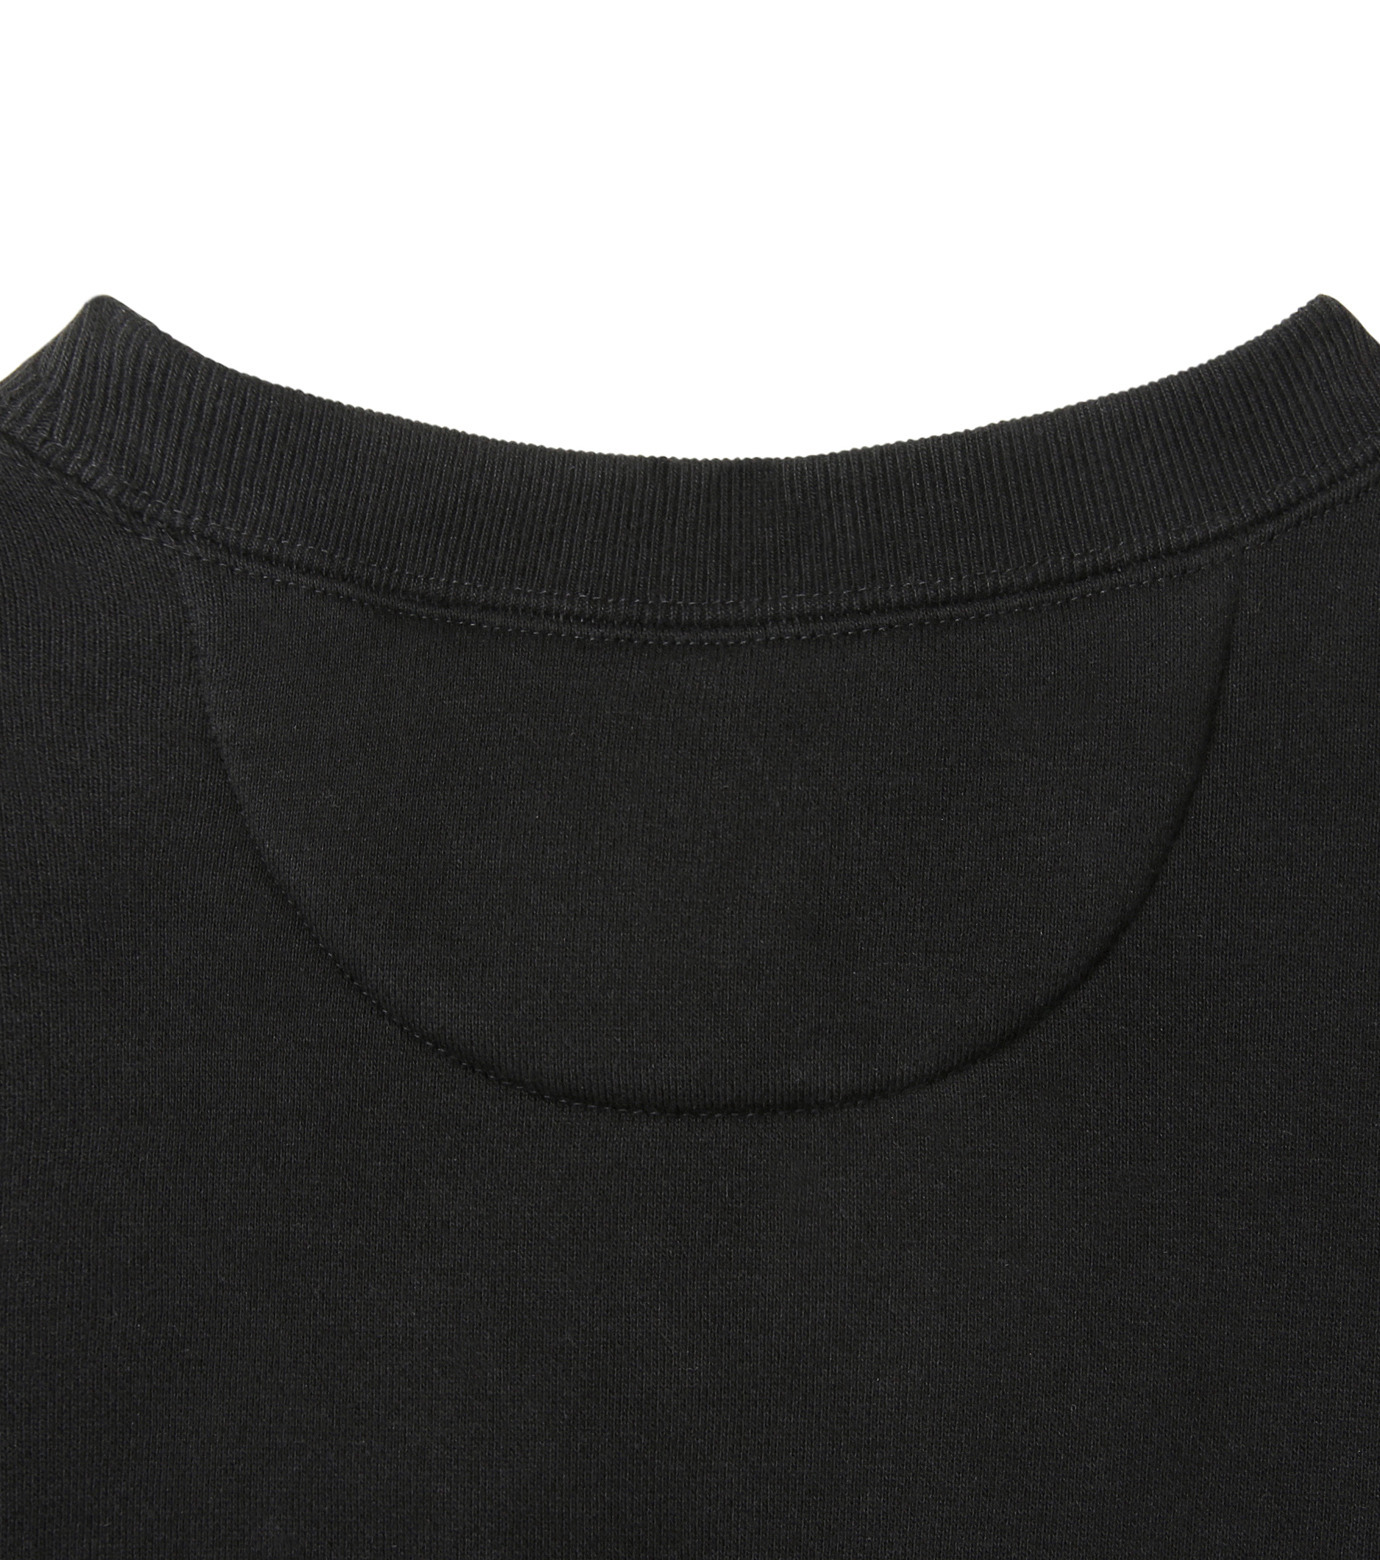 HL HEDDIE LOVU(エイチエル・エディールーヴ)のHEAVY SWEATSHIRT-BLACK(カットソー/cut and sewn)-18S92002-13 拡大詳細画像6